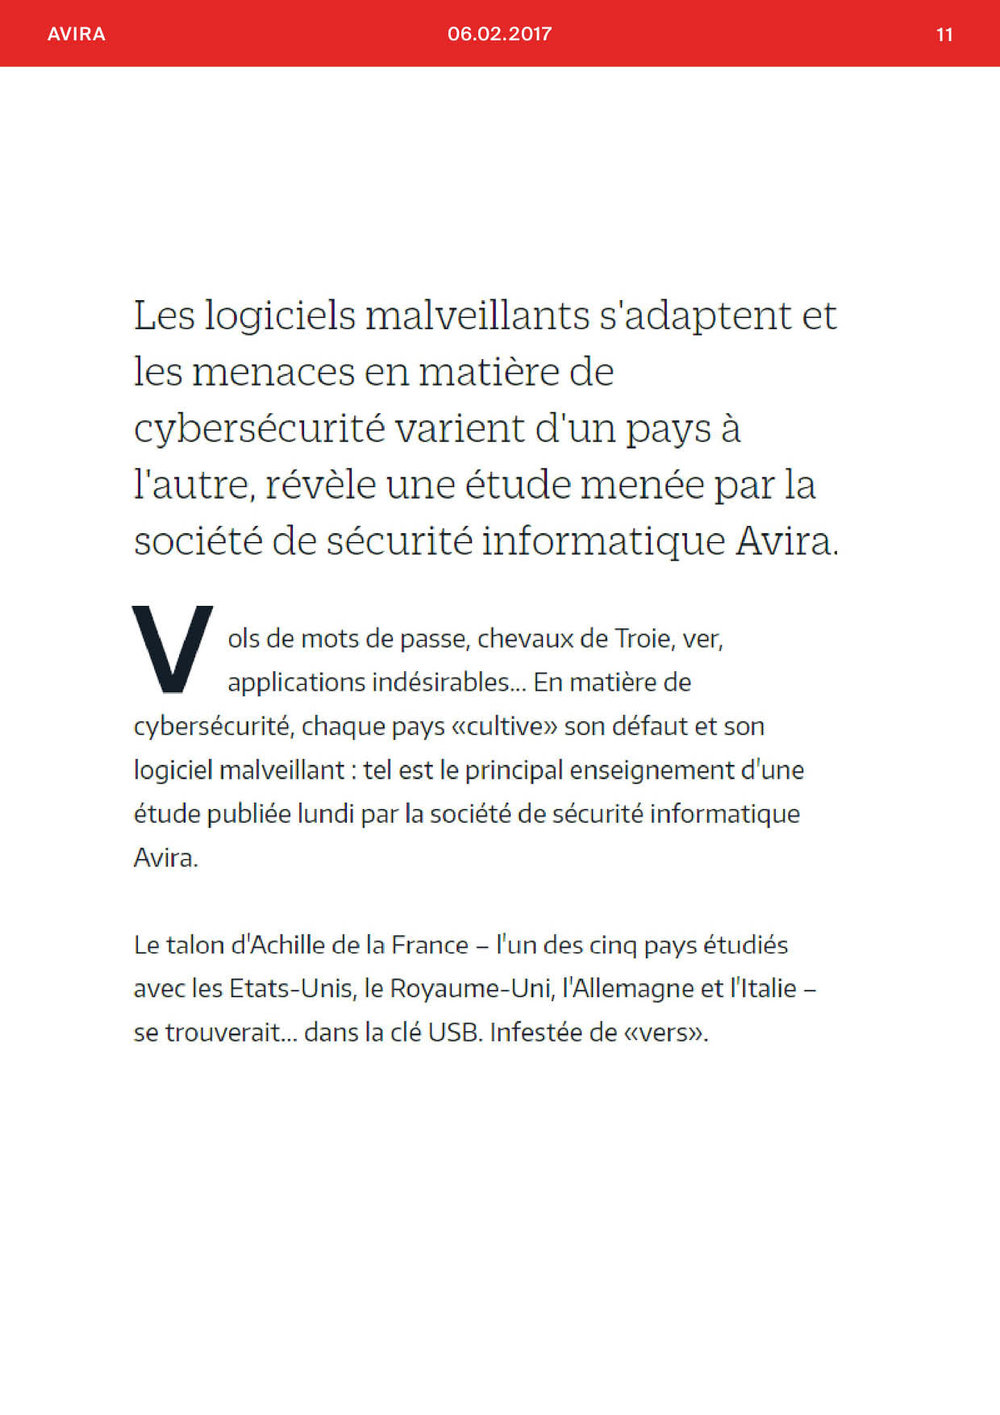 BOOKMEDIA_FEV11.jpg